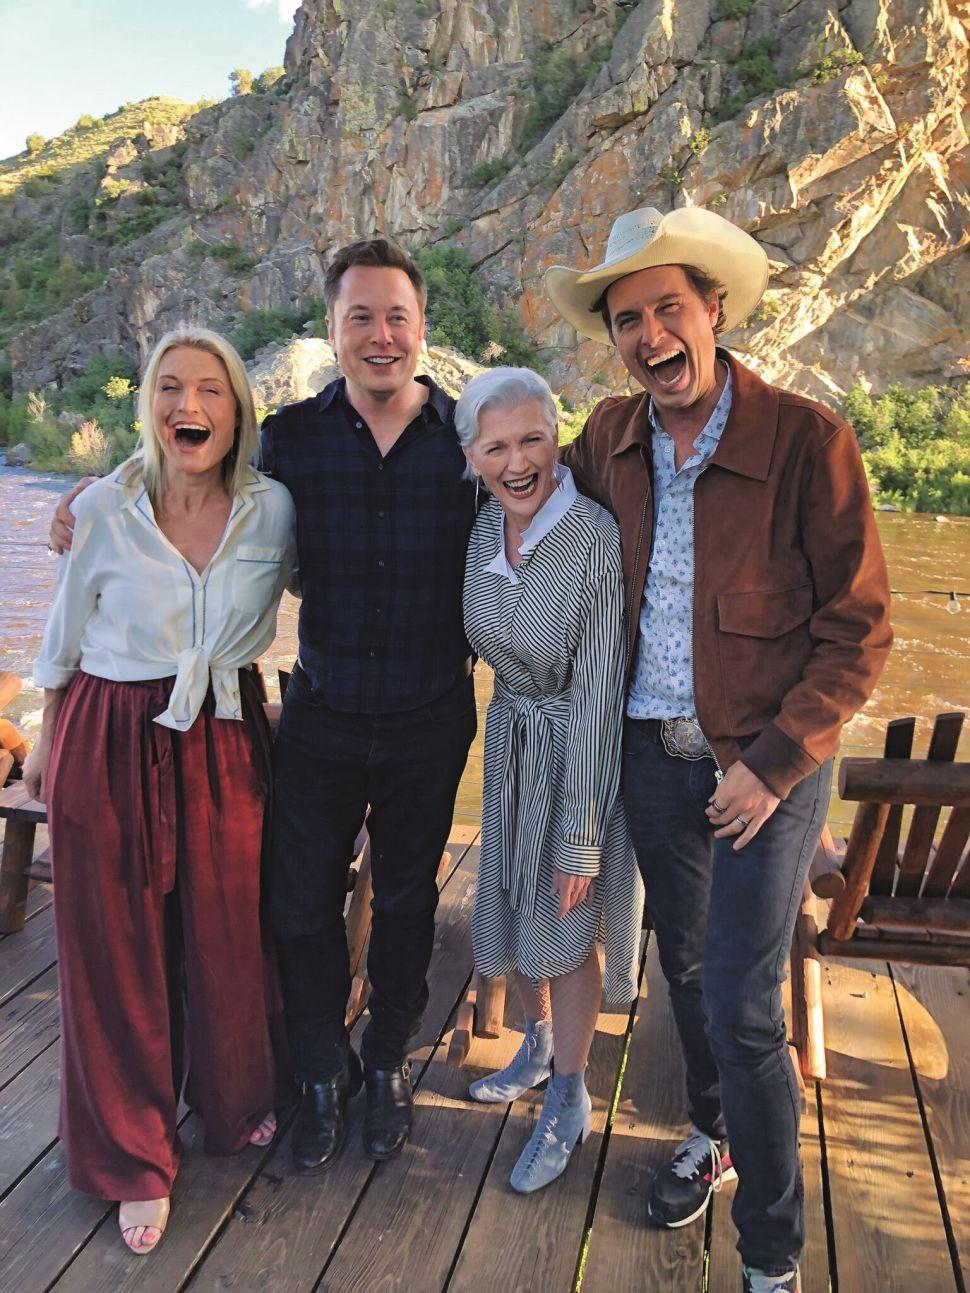 Tosca, Elon, Maye and Kimbal in 2019.